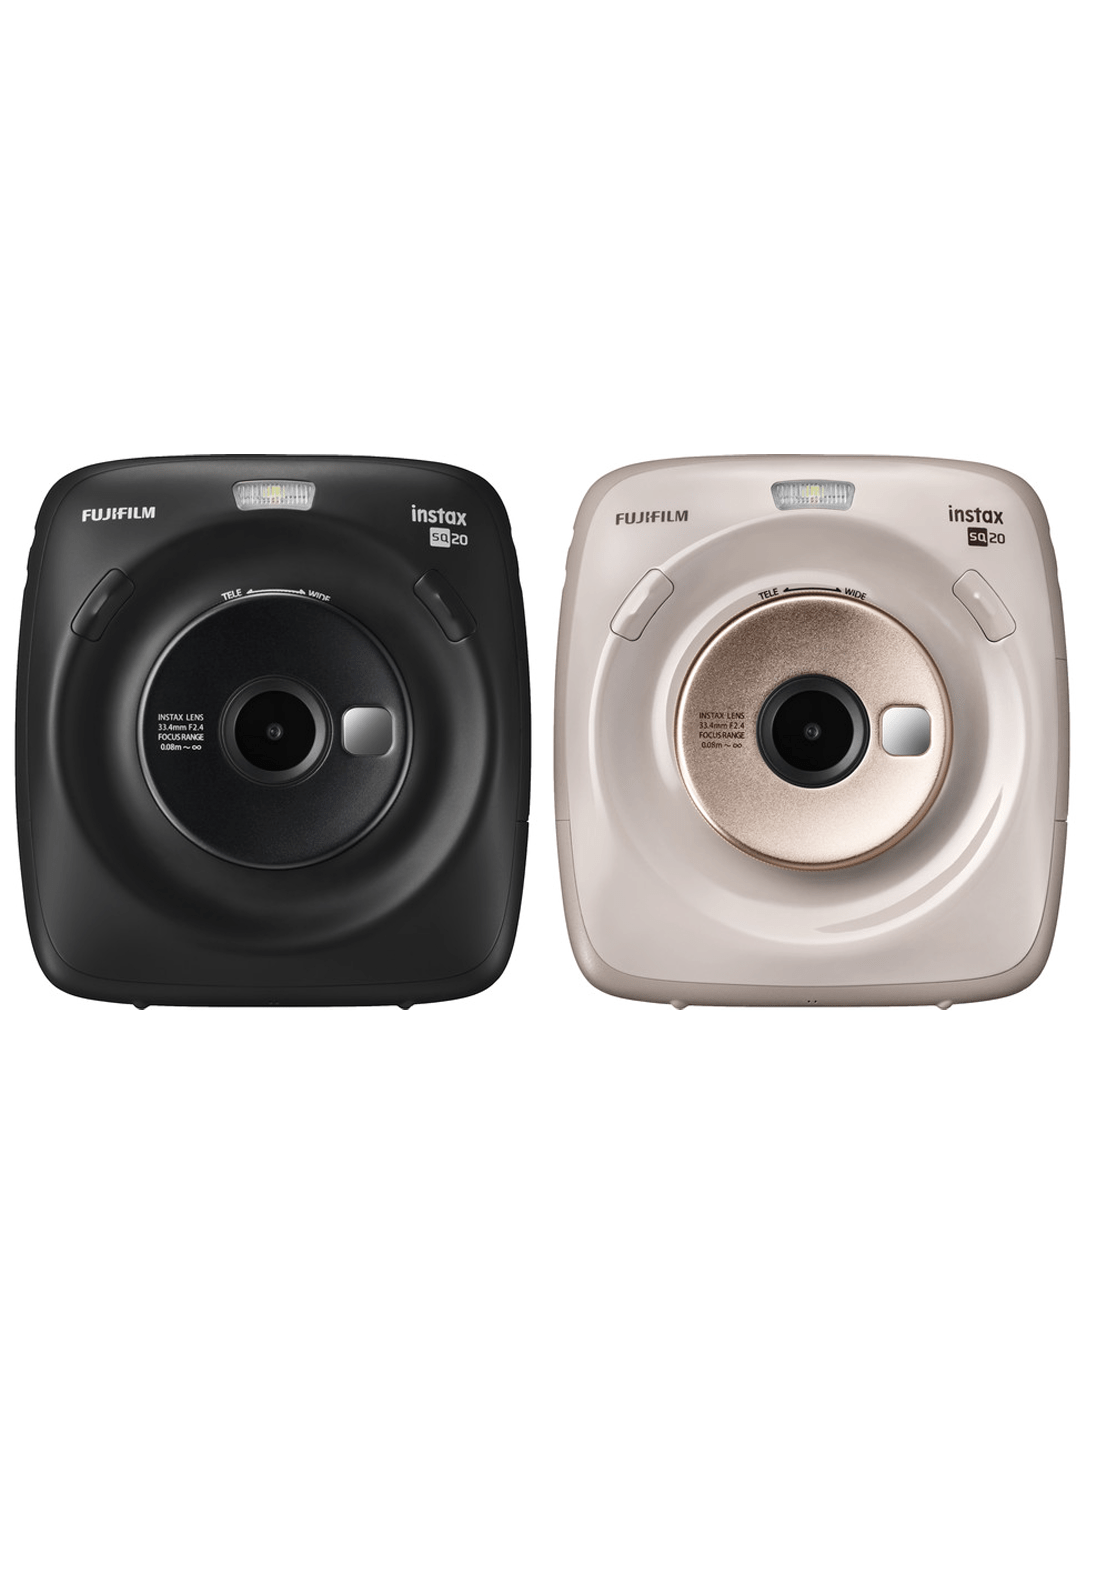 Fujifilm  SQ20 Instax Camera كاميرا